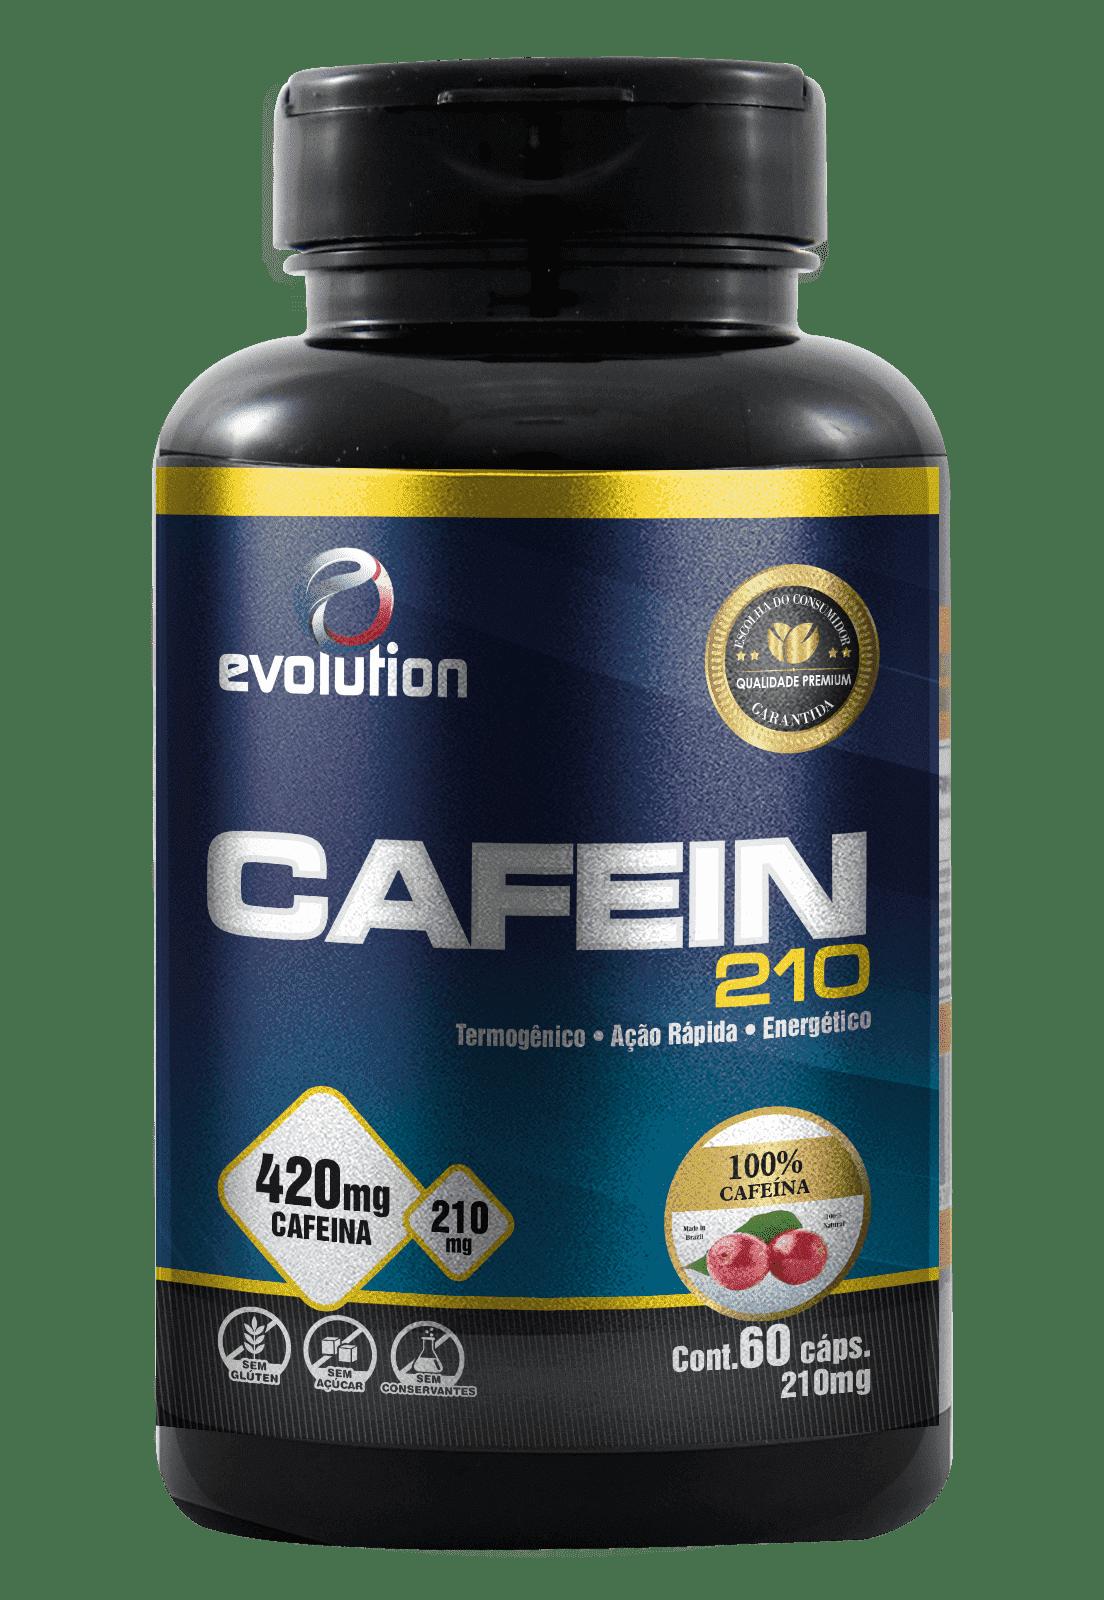 Cafein 210 (60 Cáps) - Evolution.